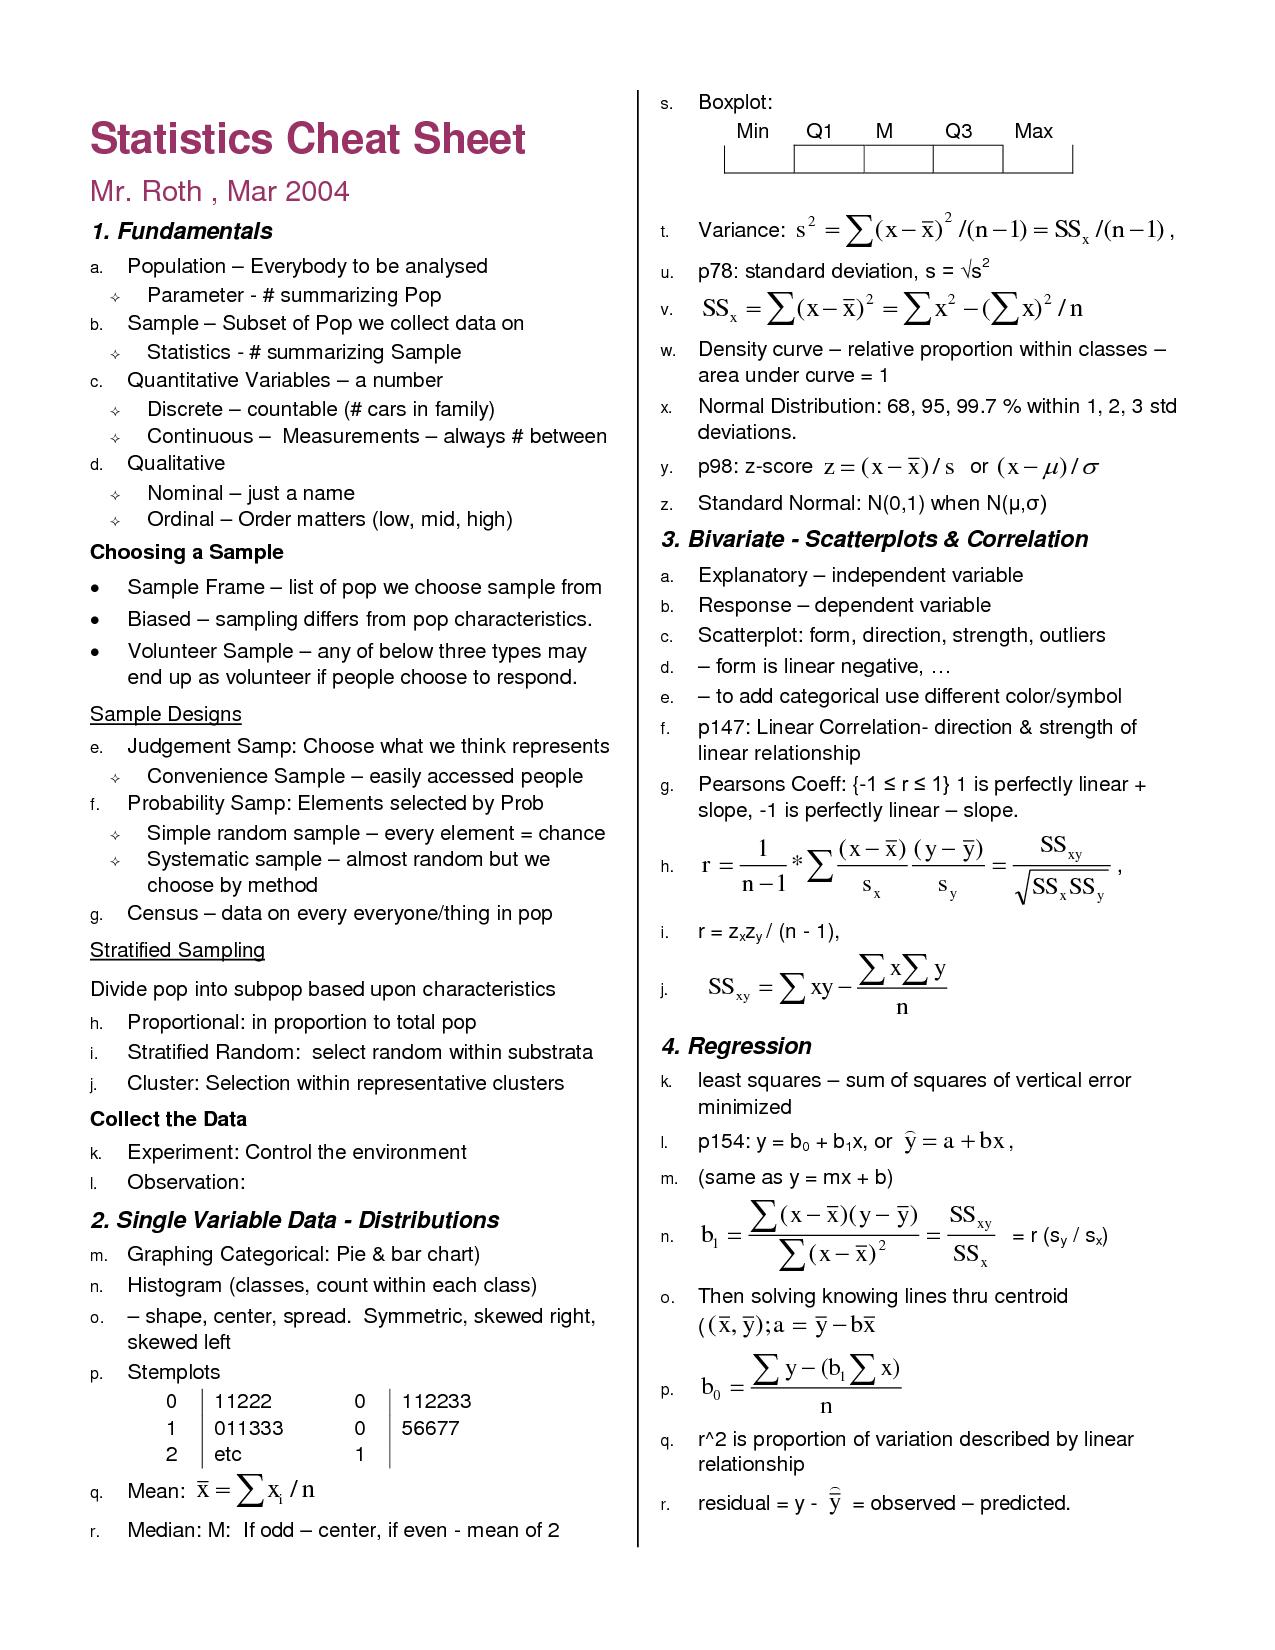 23 Awesome Statistics Formulas Cheat Sheet